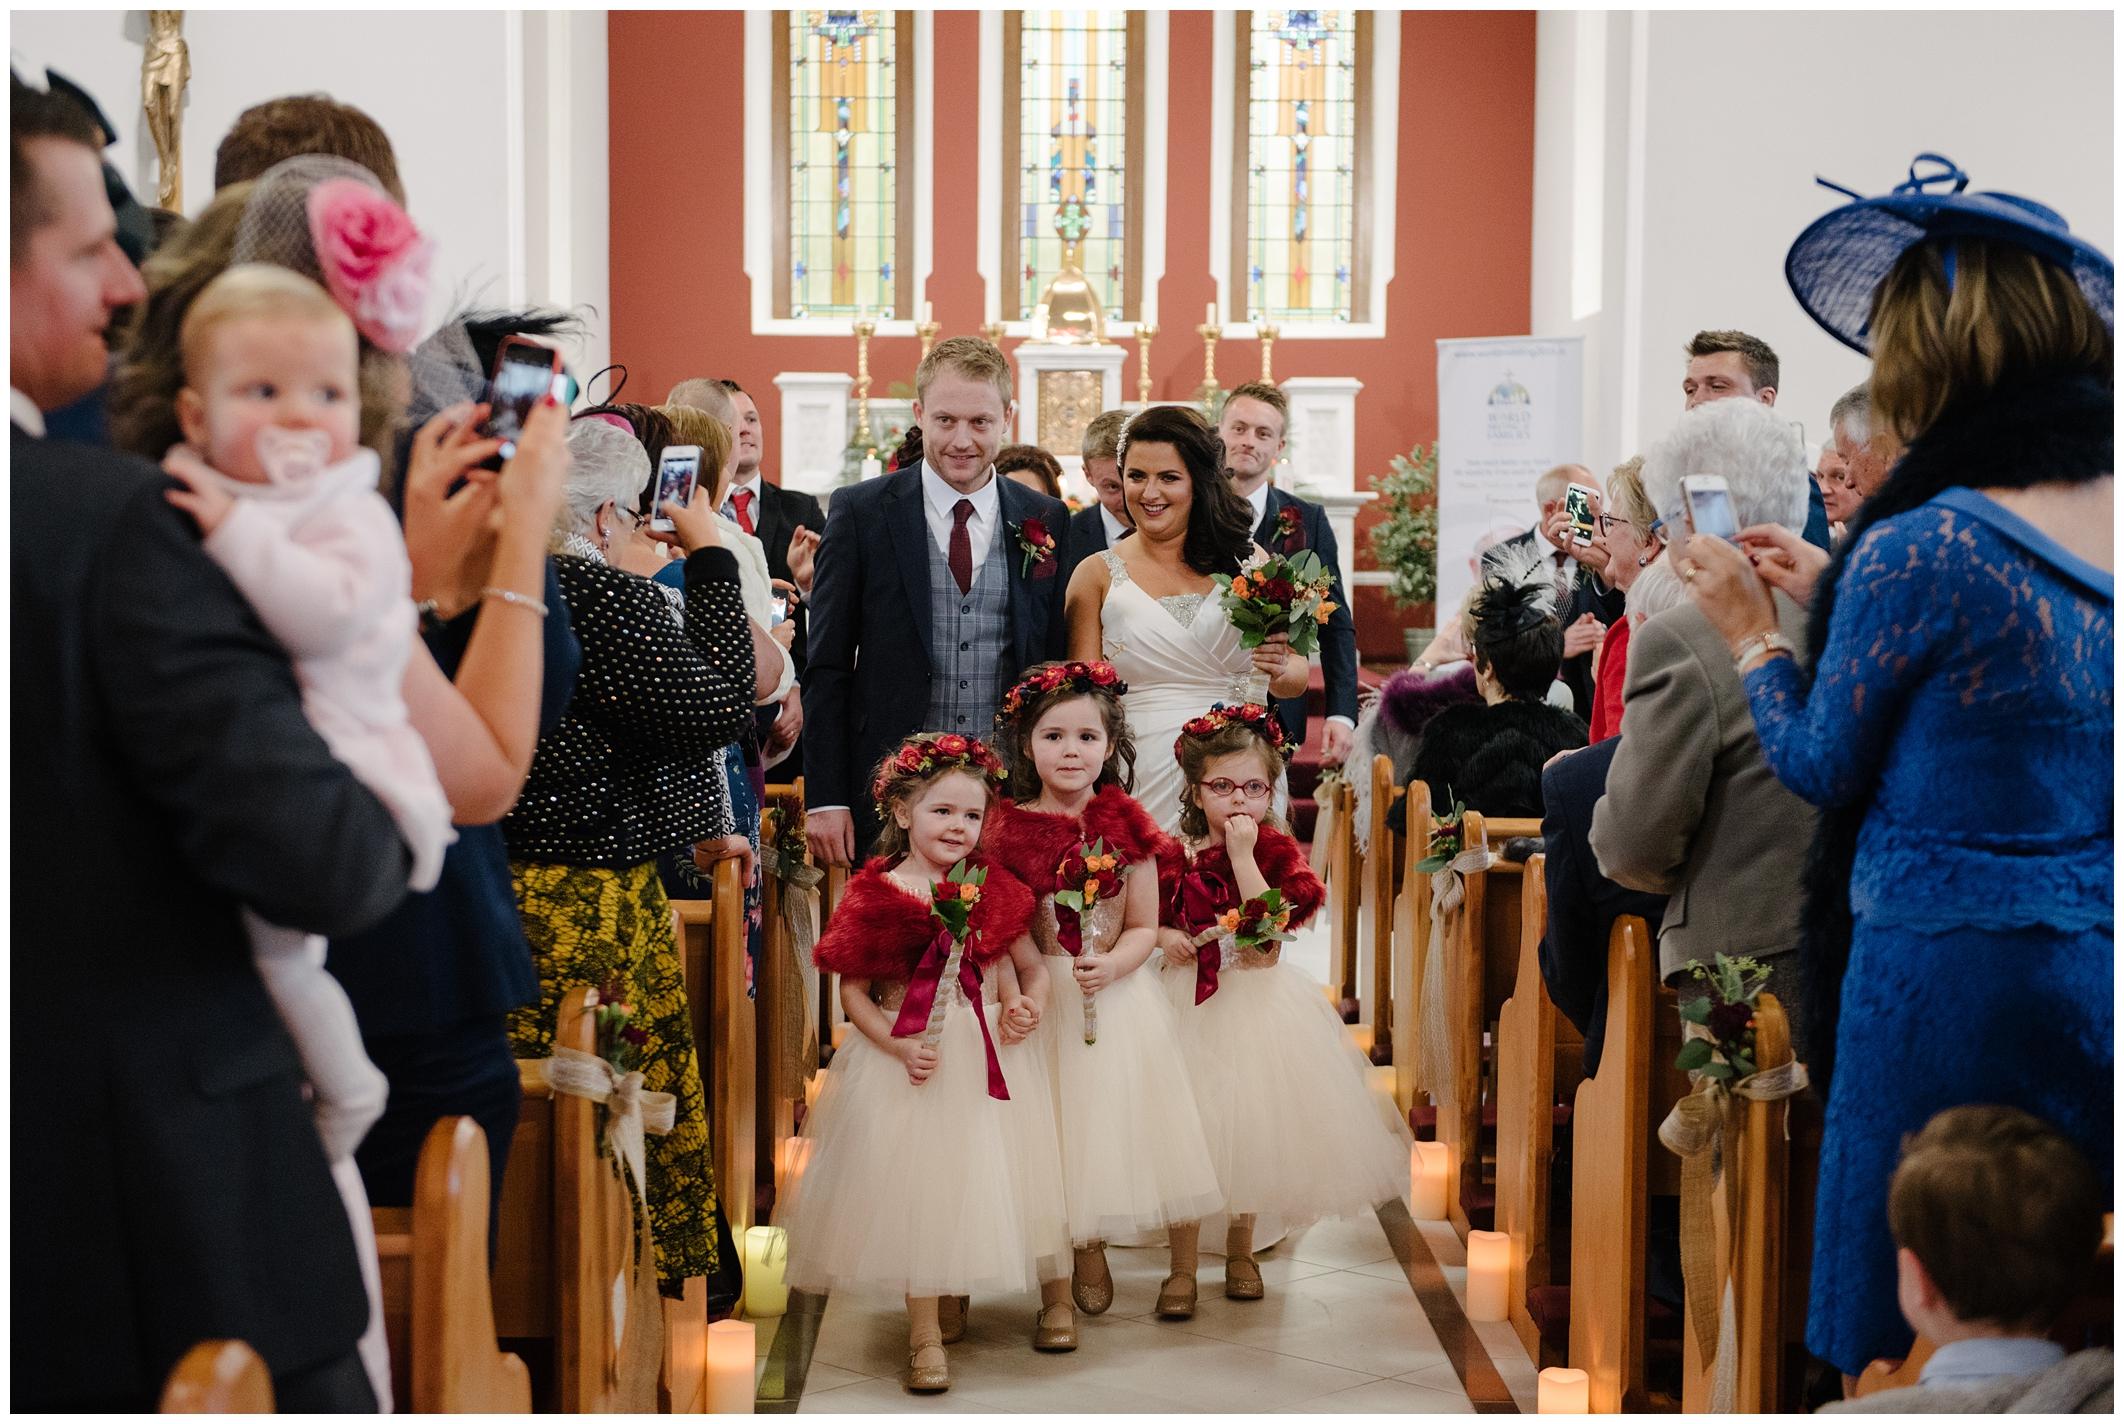 tracey_conor__wedding_jude_browne_photography_0035.jpg